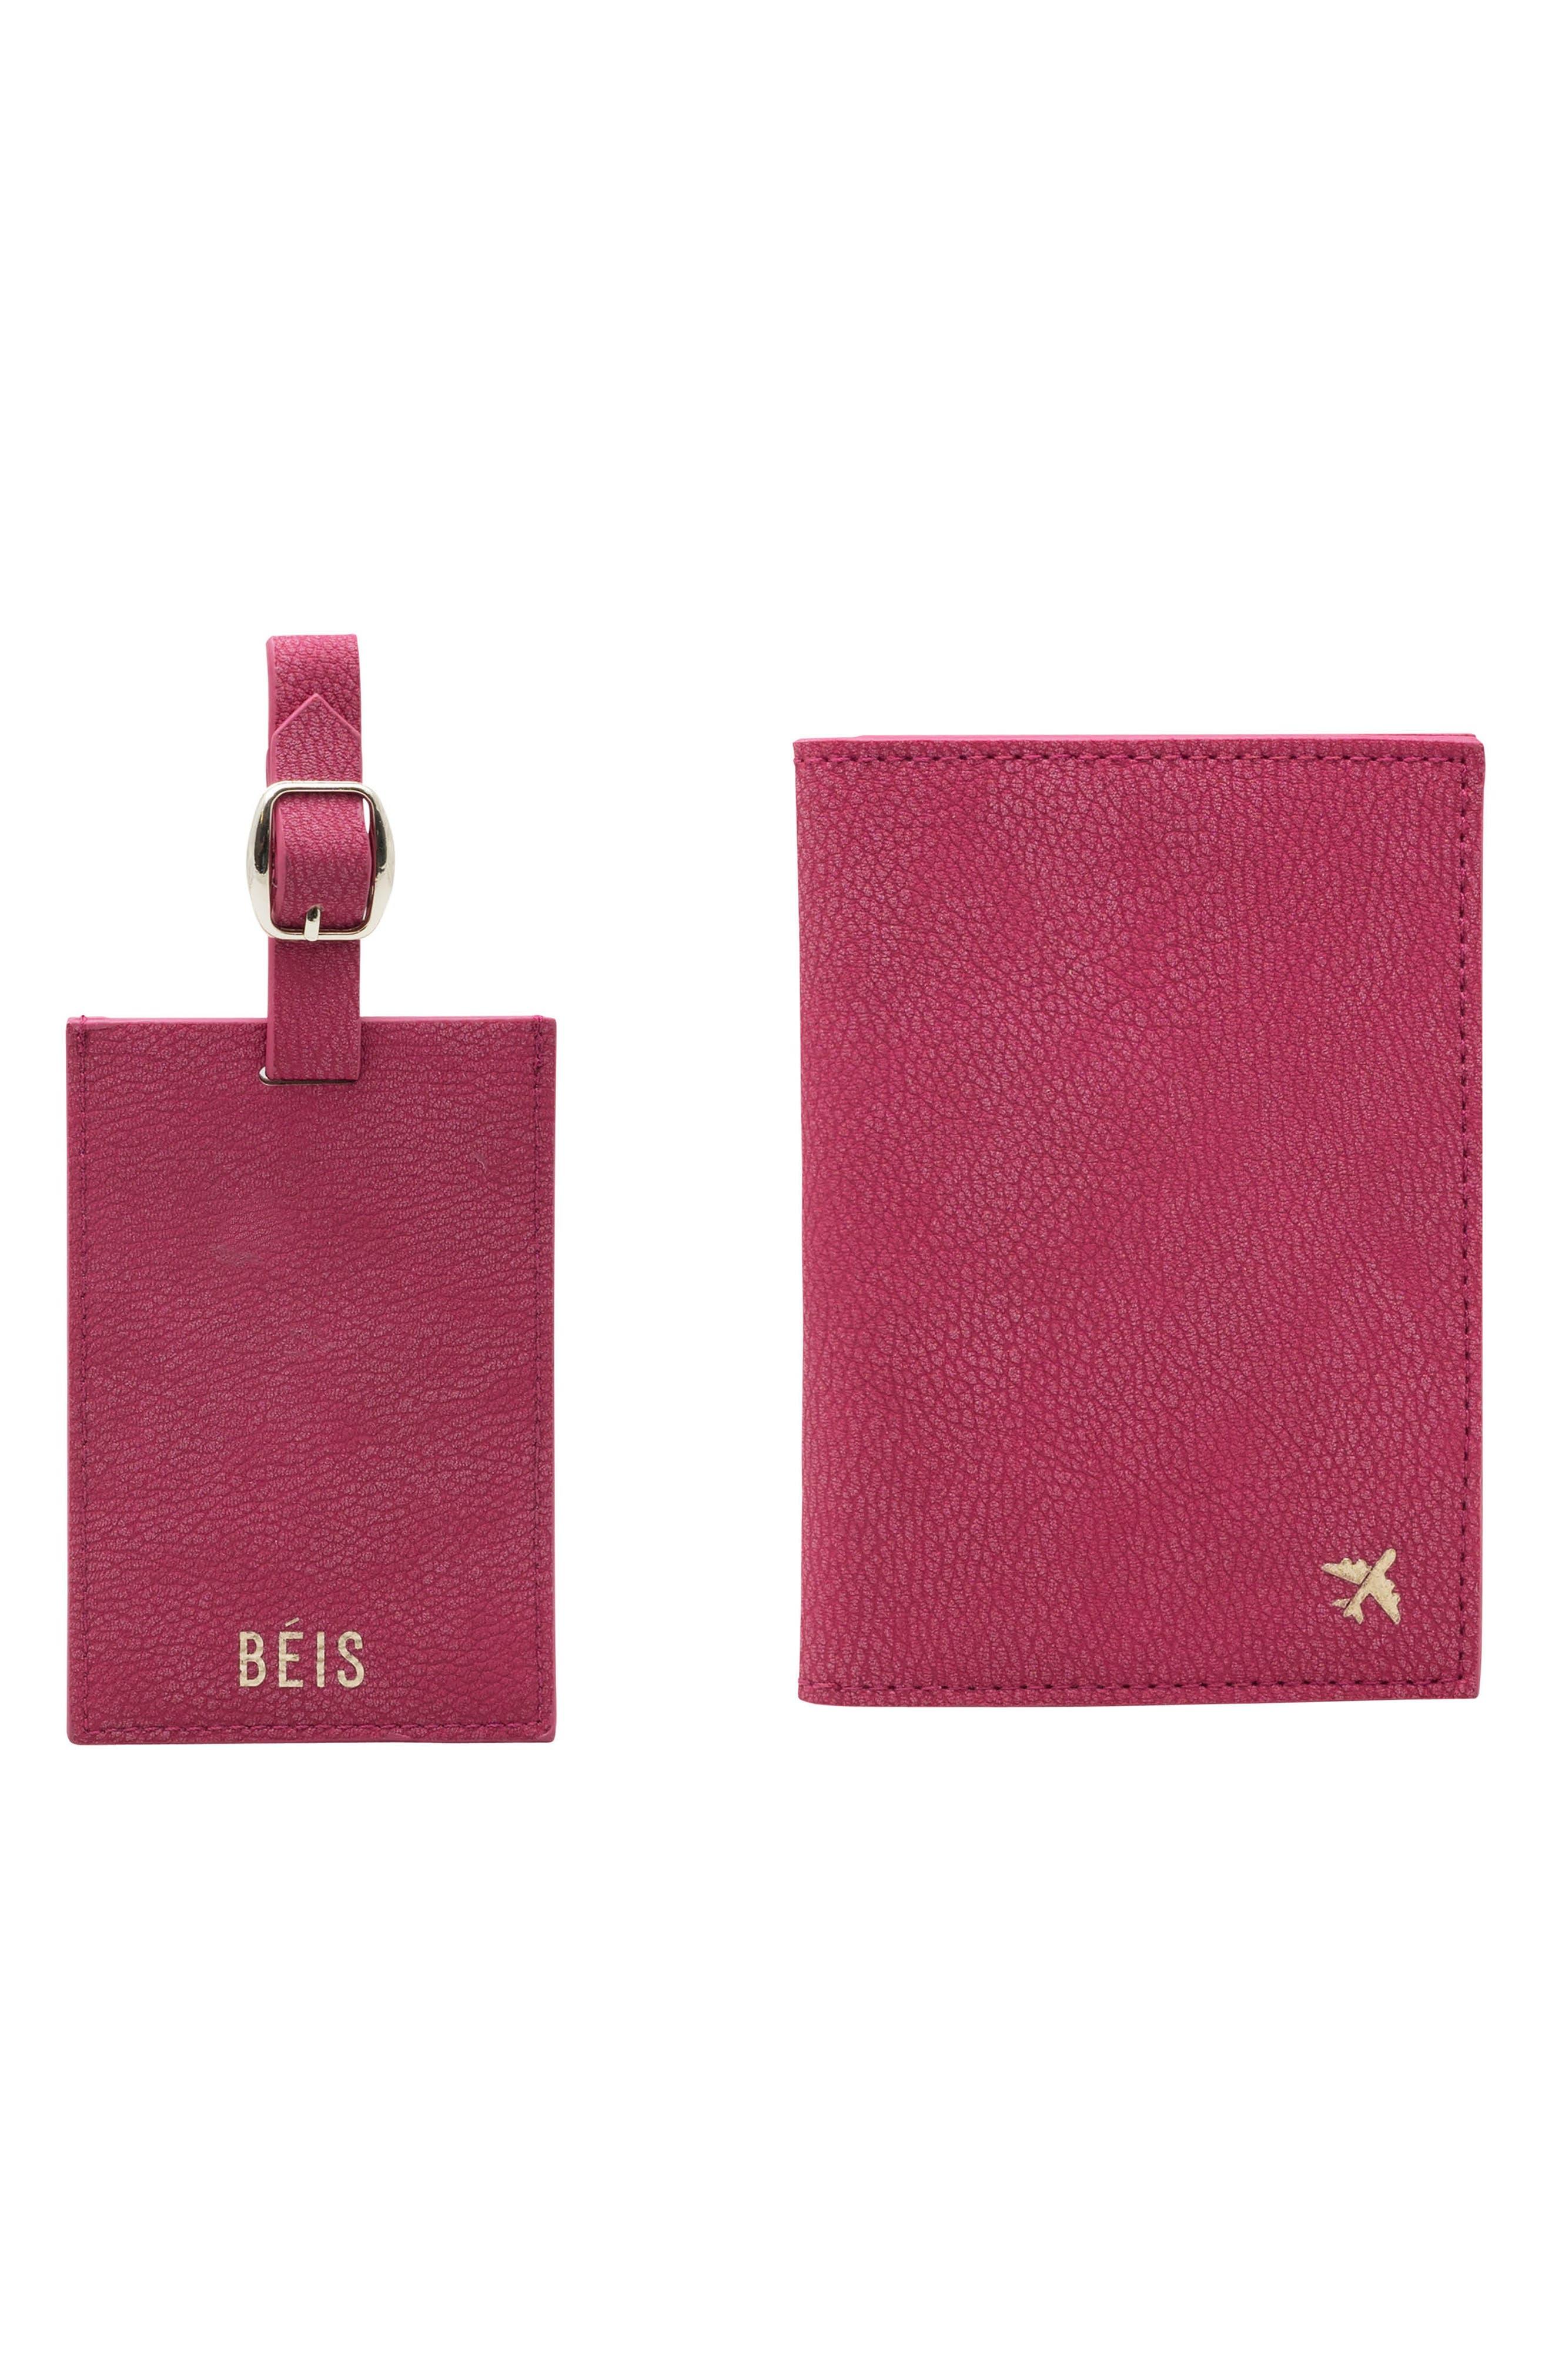 Travel Luggage Tag & Passport Holder Set,                         Main,                         color, MAGENTA